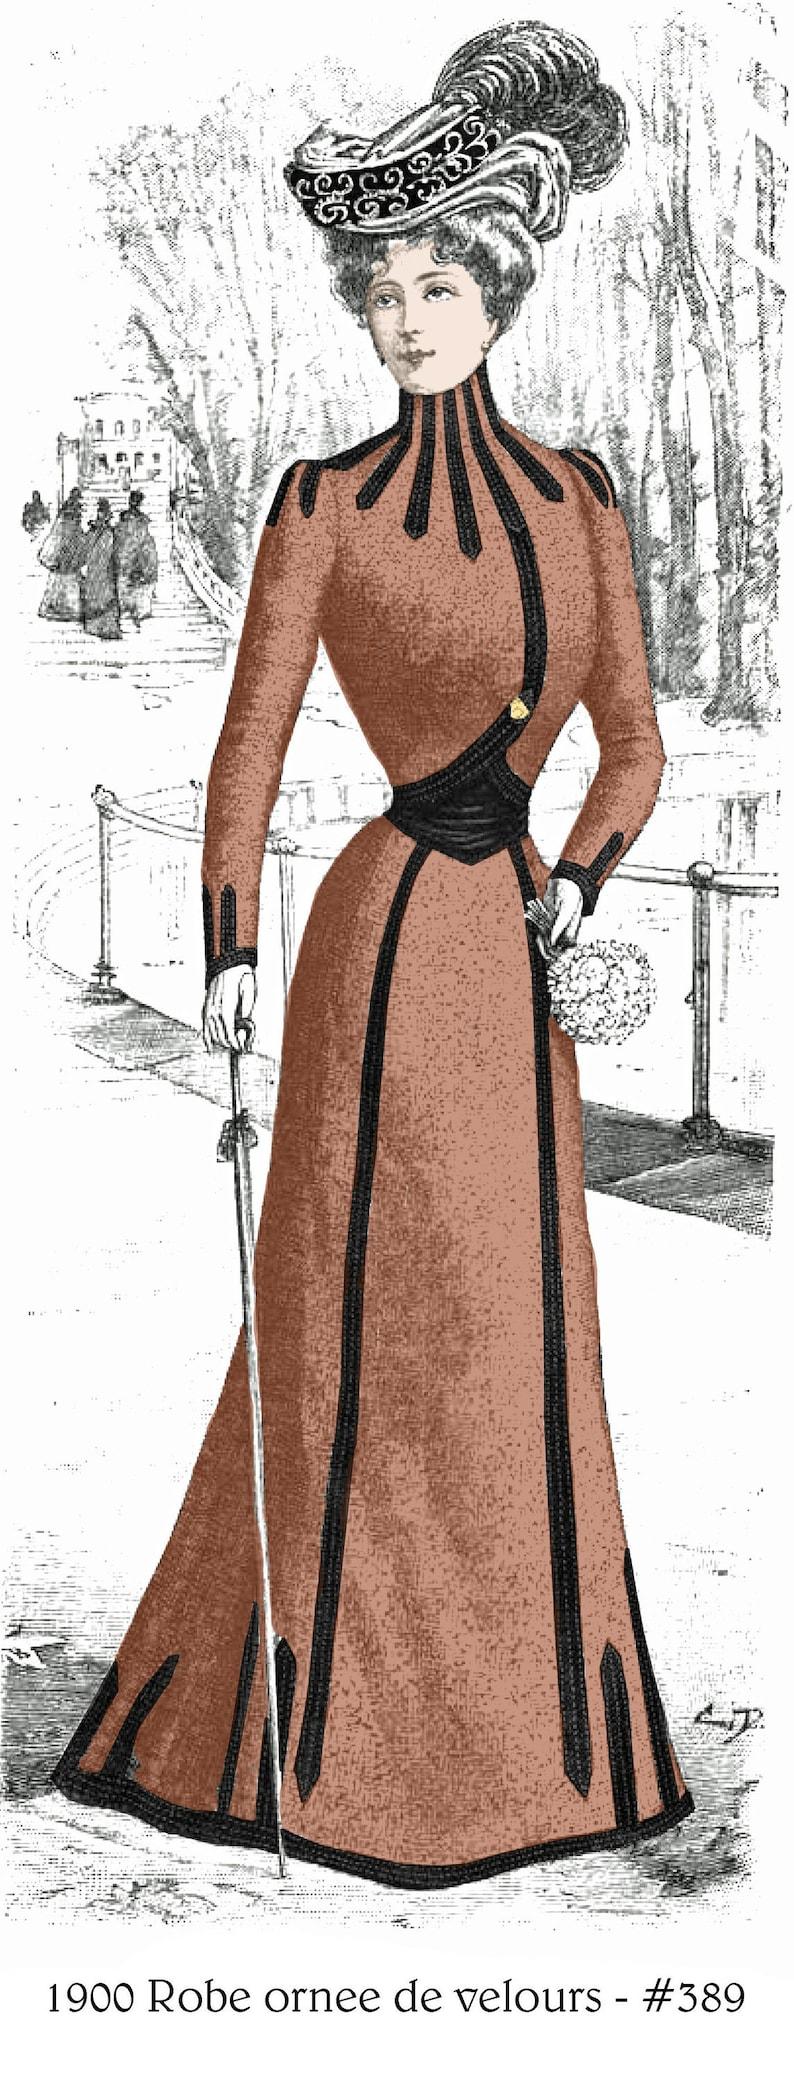 5 Victorian Edwardian Wedding Dress Fashion Prints Reproduction Pictures NEW Set